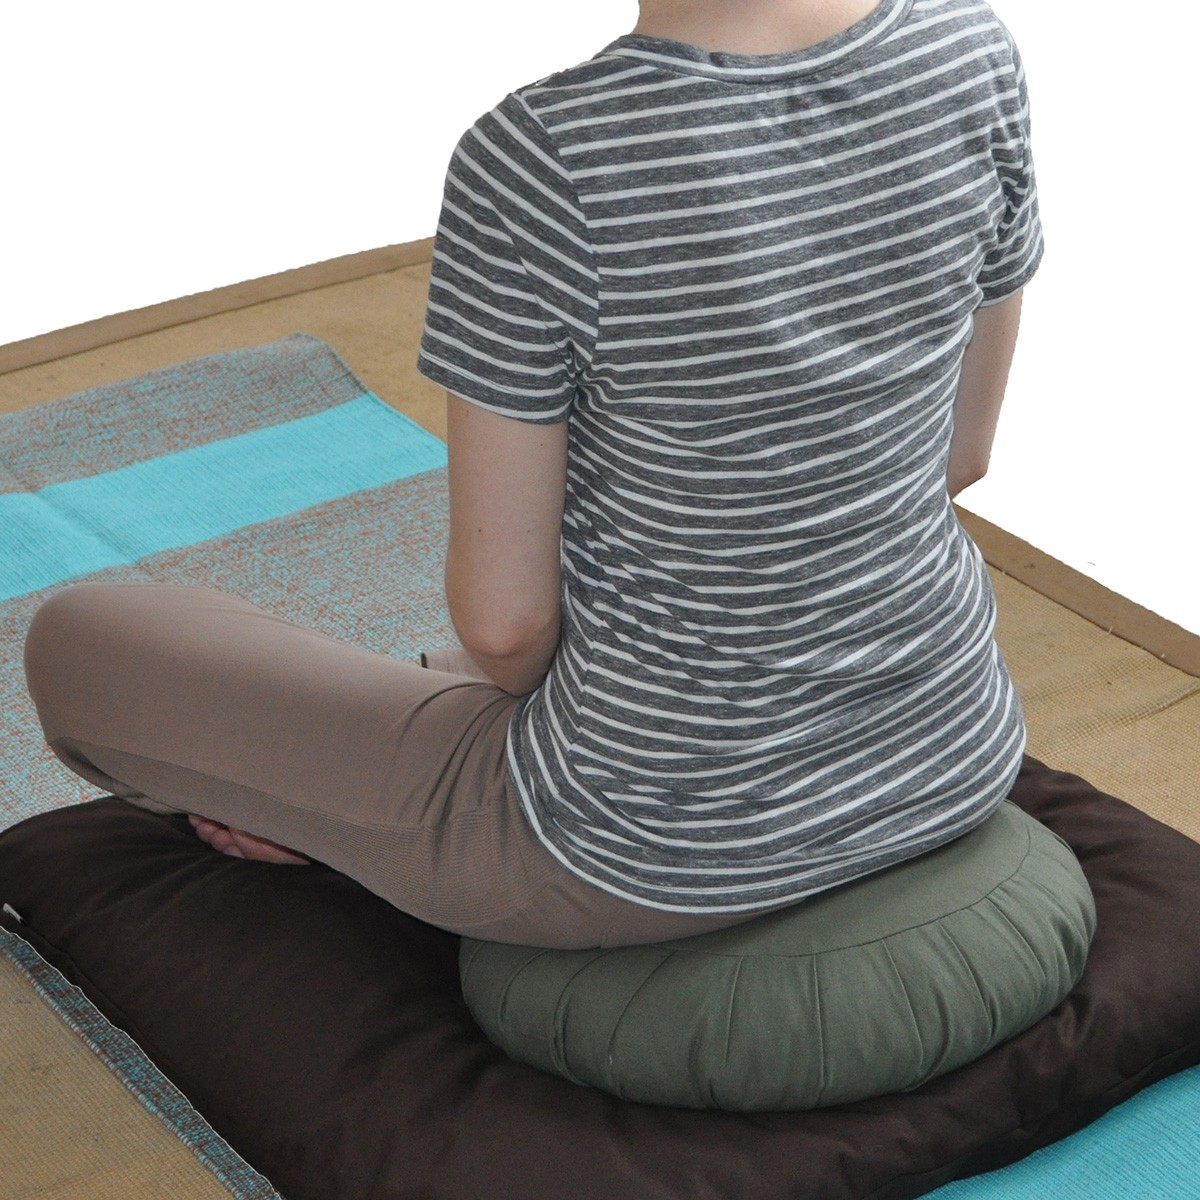 Silk Sari Zafu Meditation Cushion With Carry All Yoga Bag